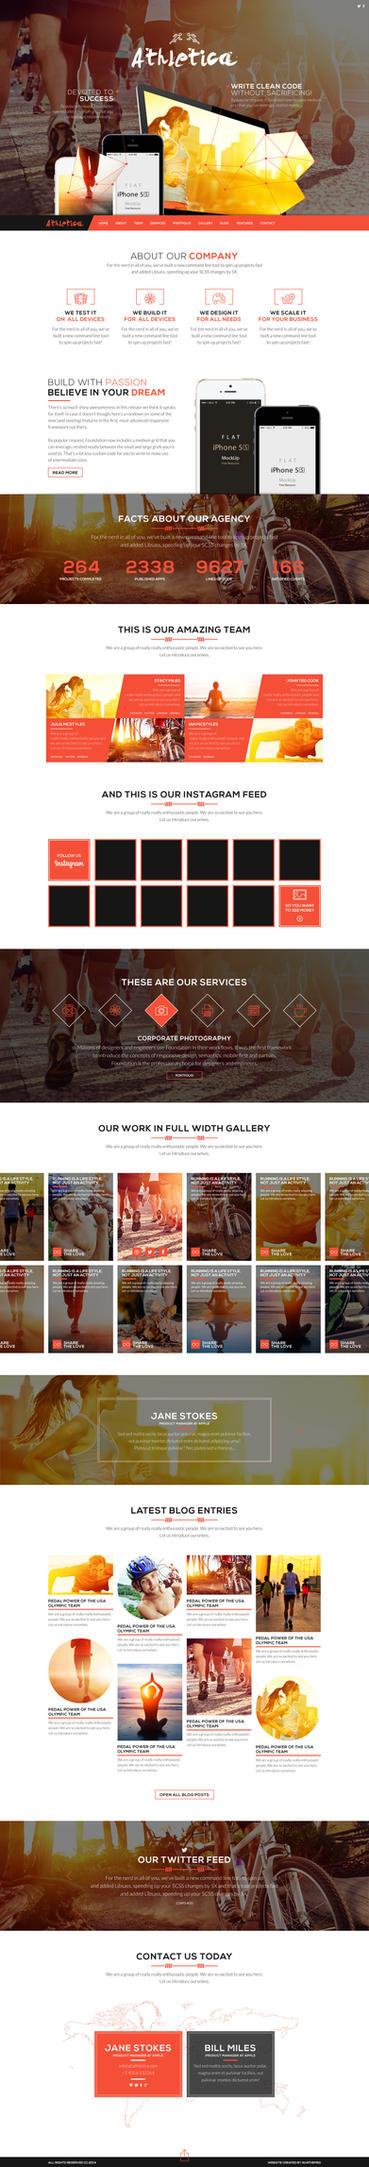 Athletica Parallax Web Theme by sandracz